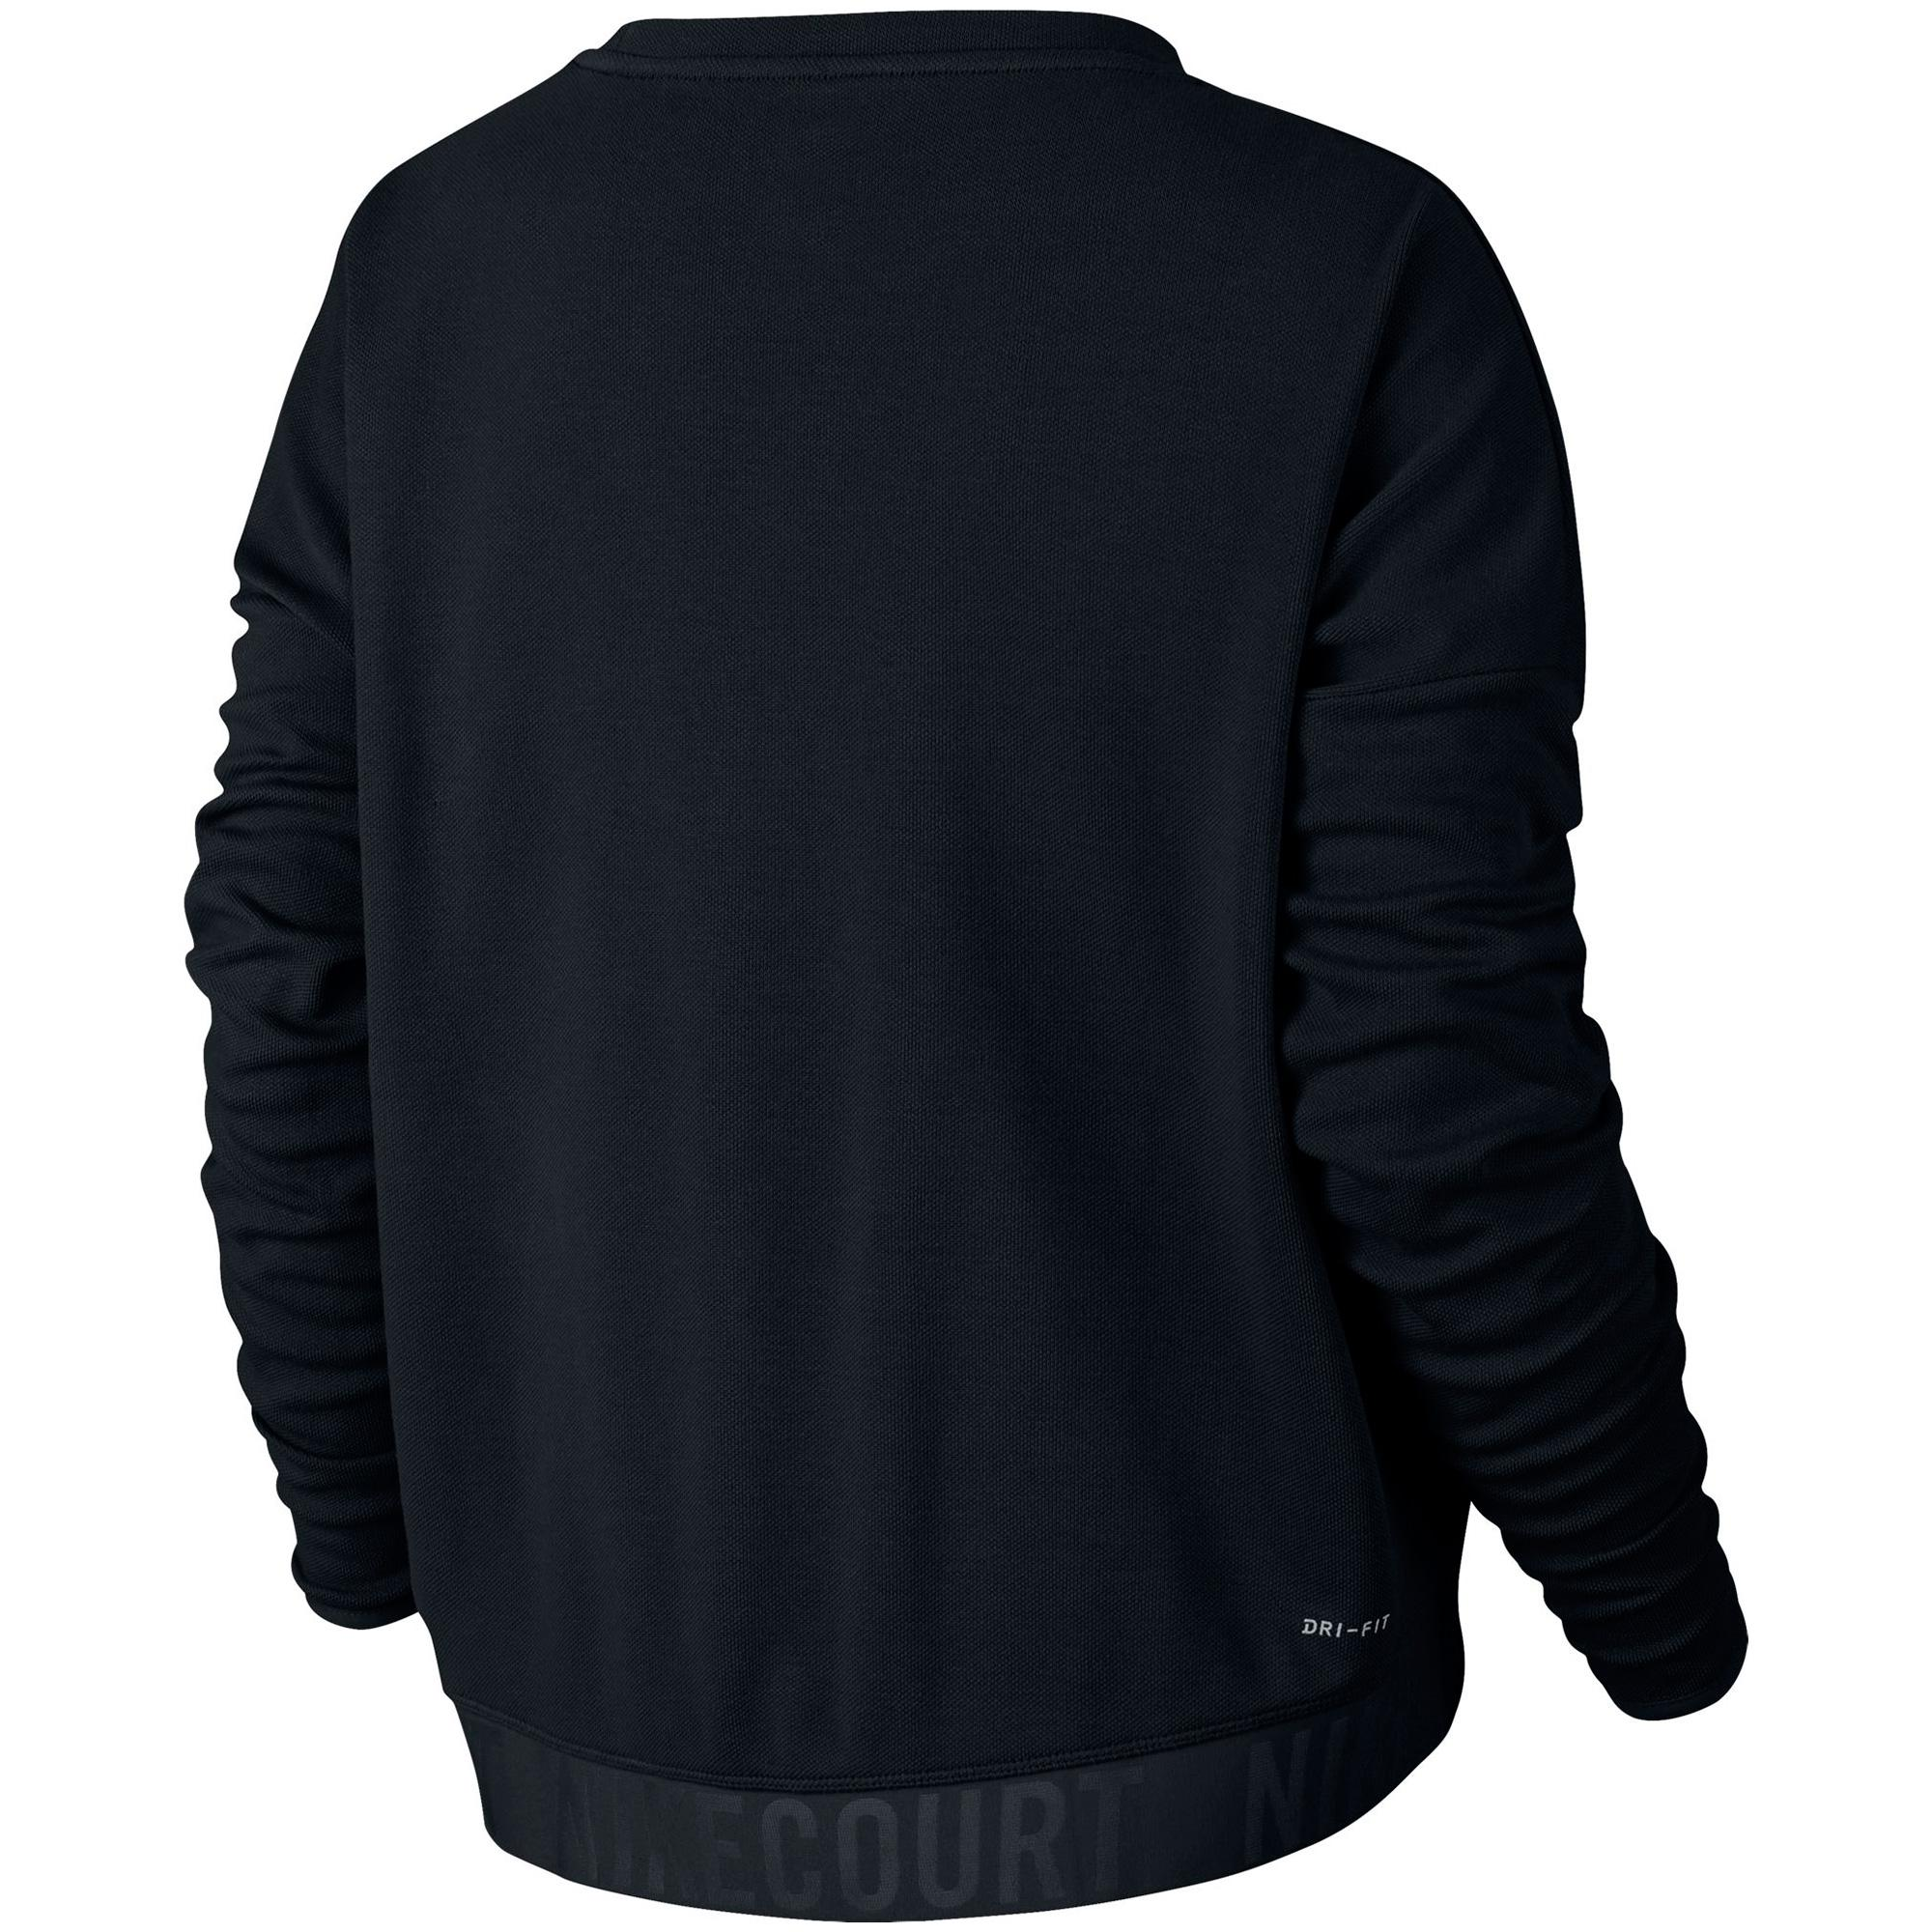 Nike Womens Long Sleeve Cropped Tennis Top Black